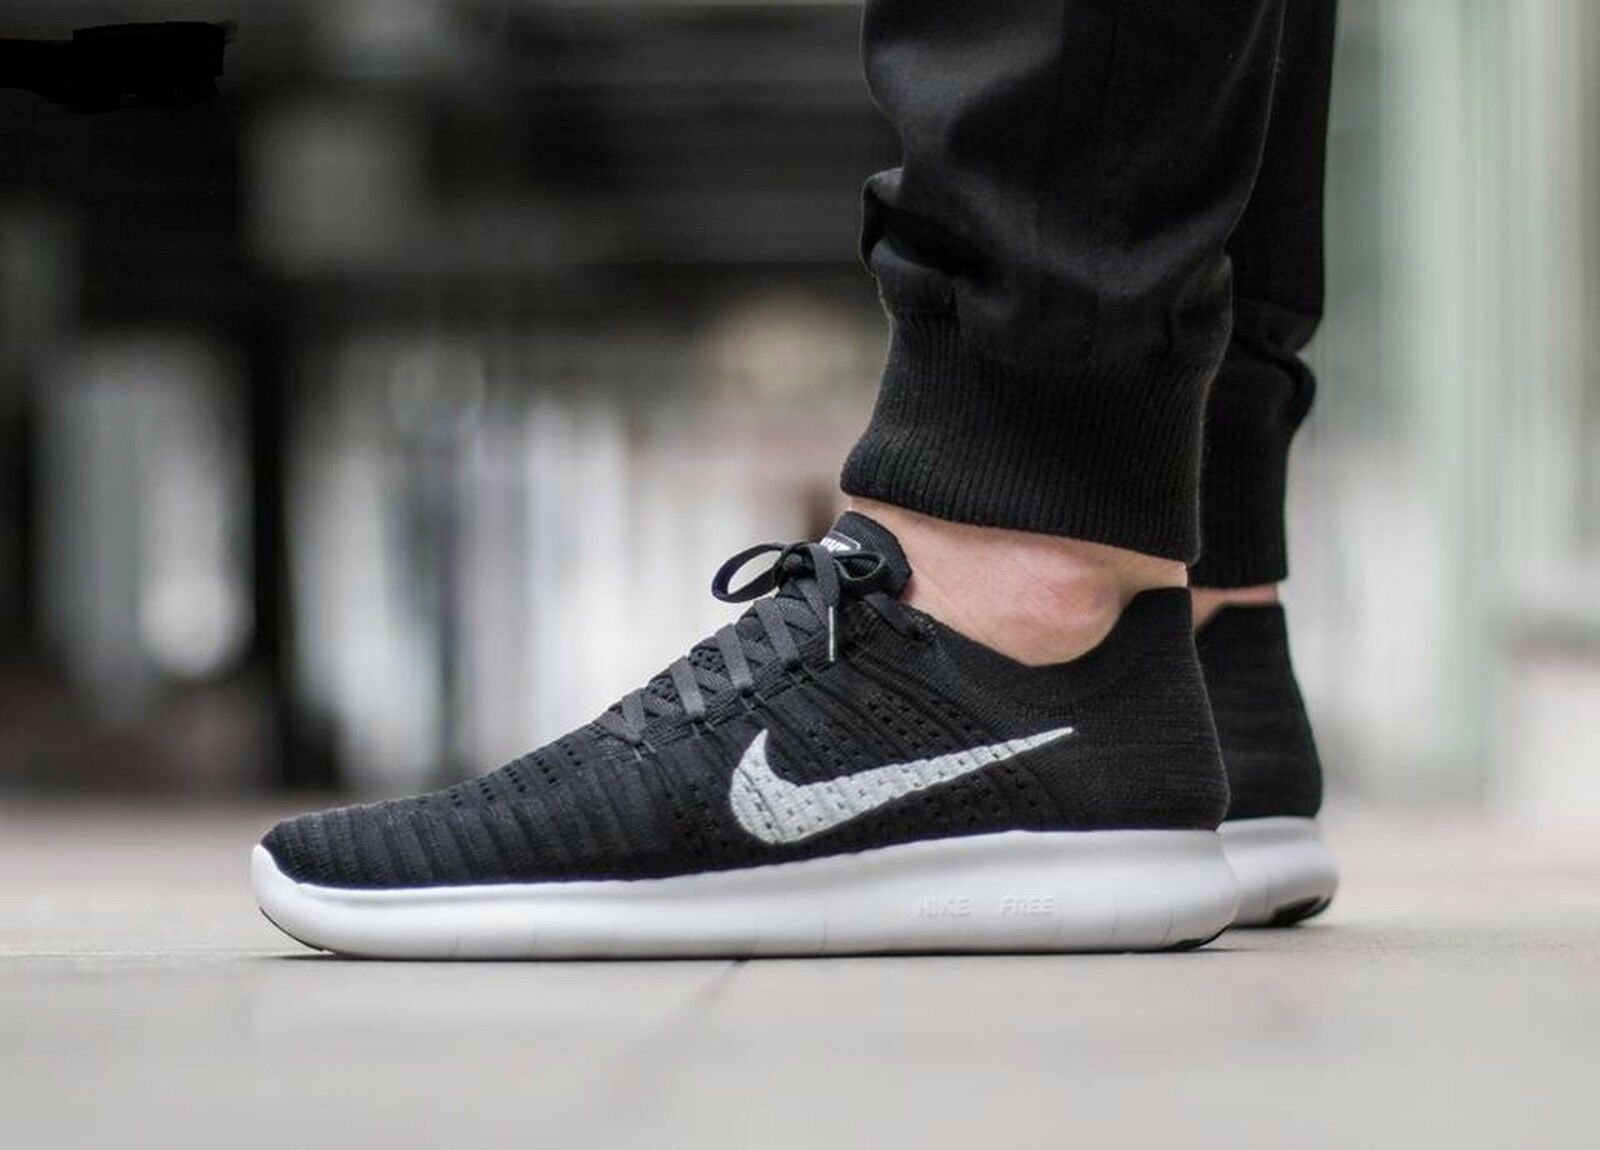 Nike Free RN Flyknit  Running Shoes Nero White 831069 001 Uomo Sz 13